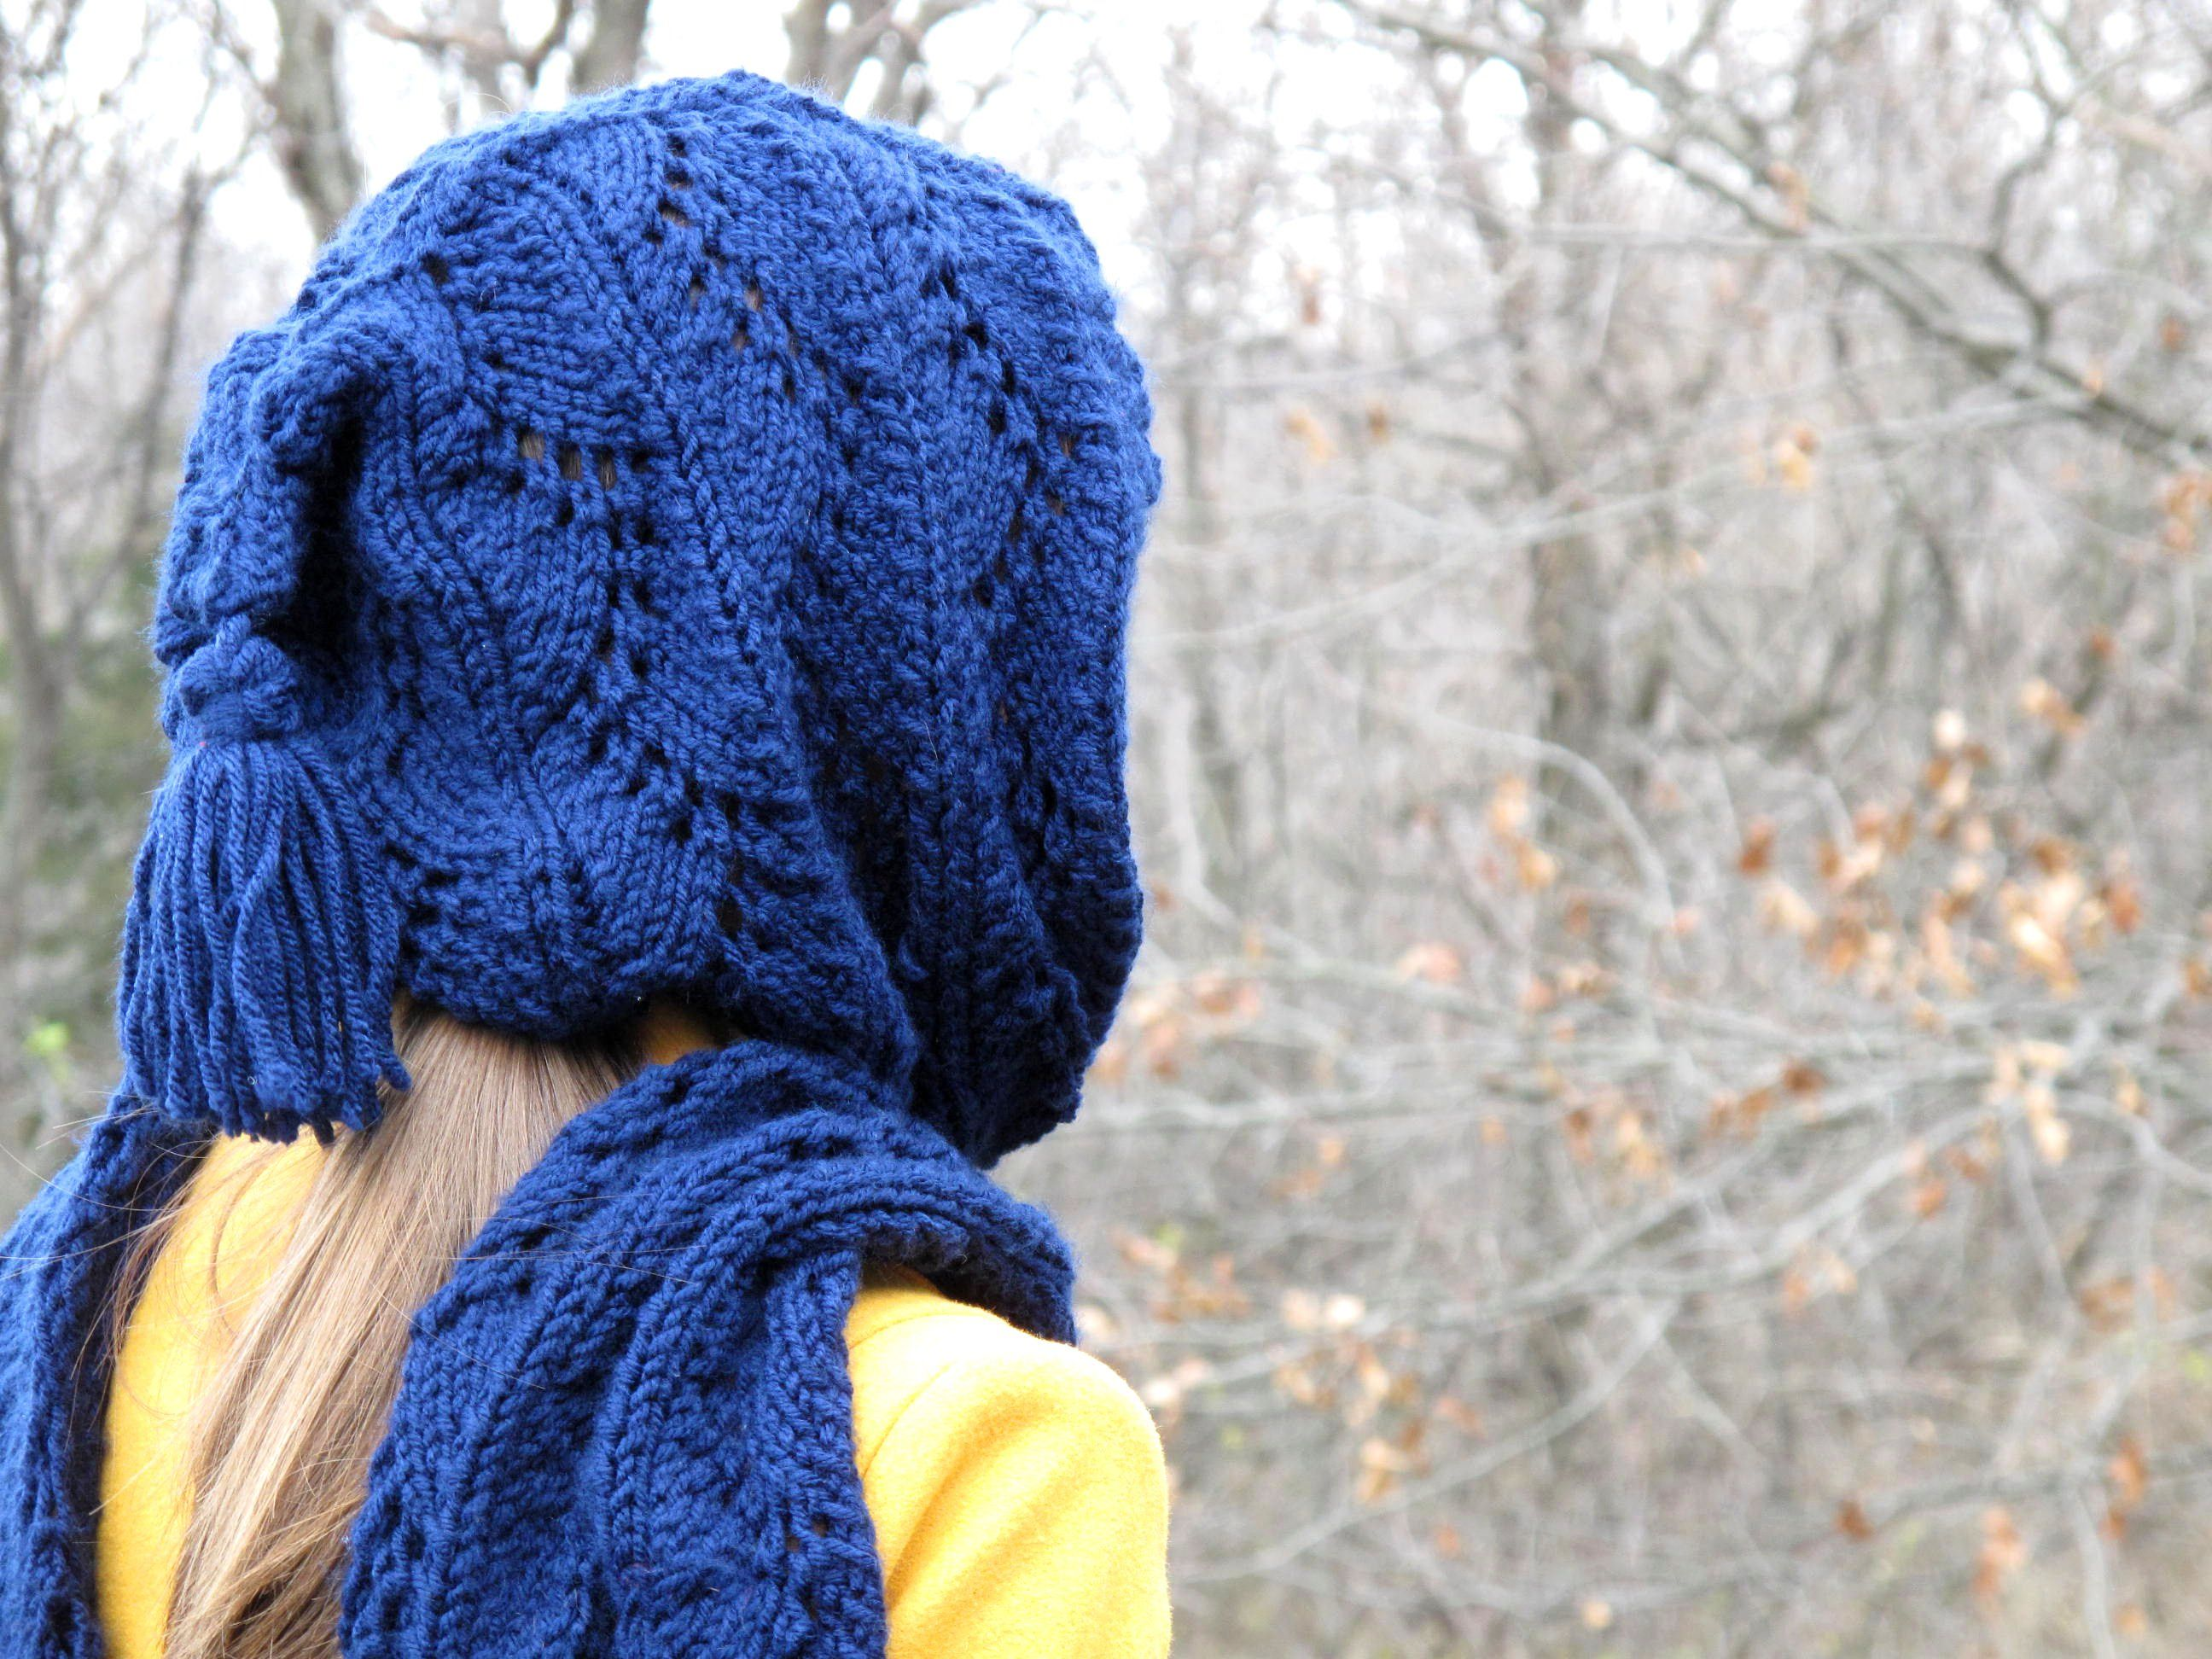 Stylish Hooded Scarf Free Knitting Pattern   Hooded scarf, Knitting ...